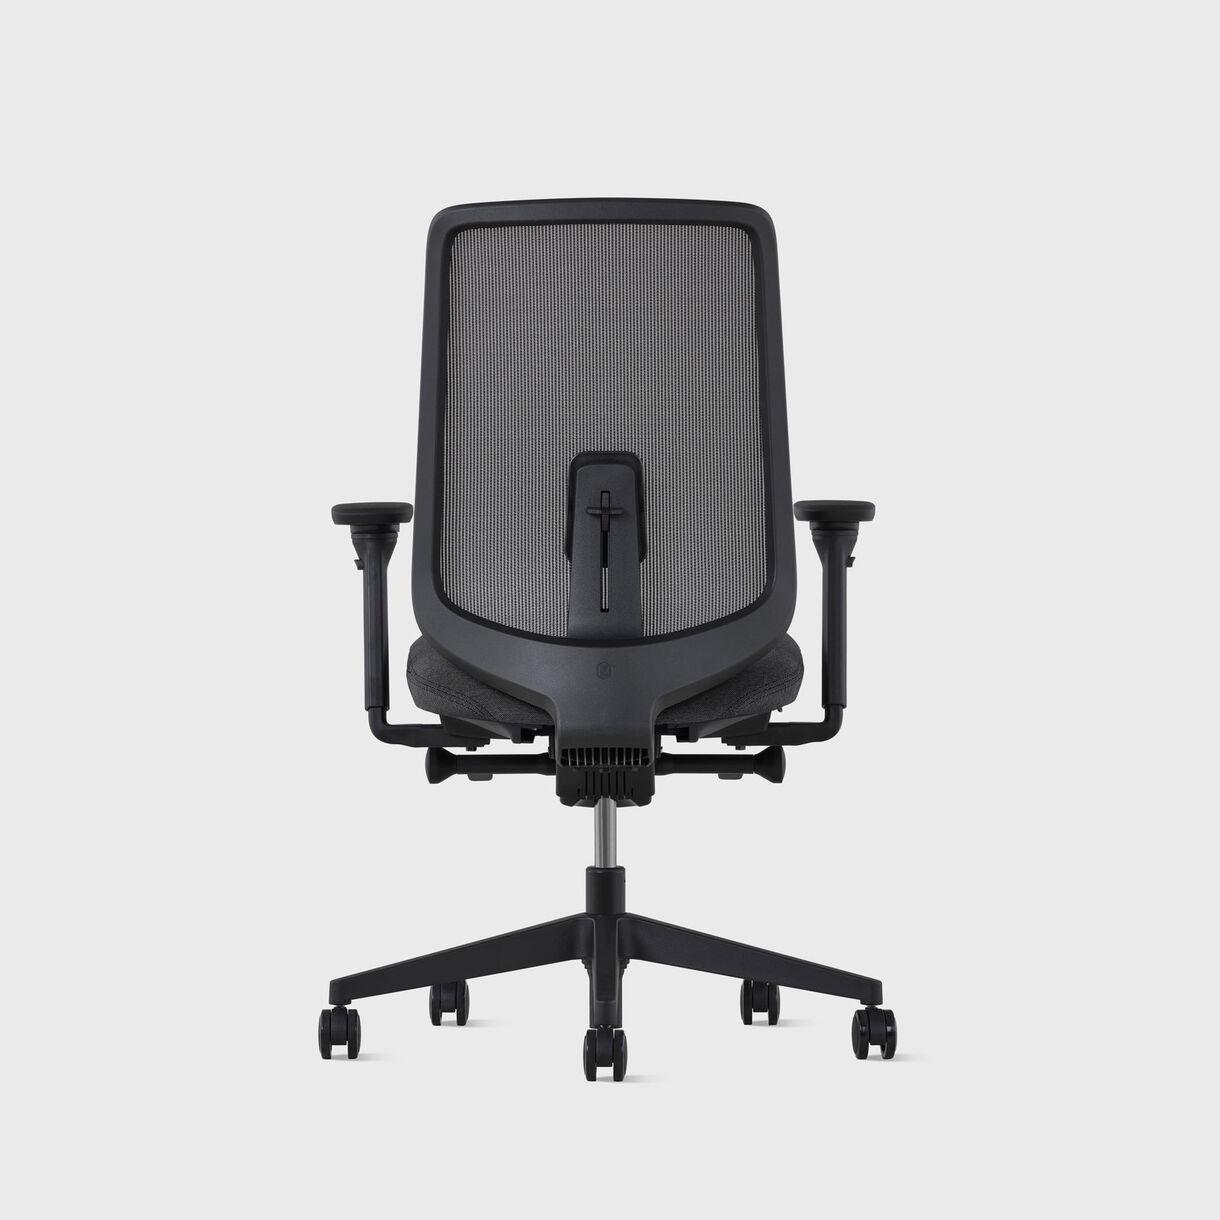 Verus Suspension Back Task Chair - Black Frame, Shale Interweave & Cinder Upholstery - Fully Adjustable Arms